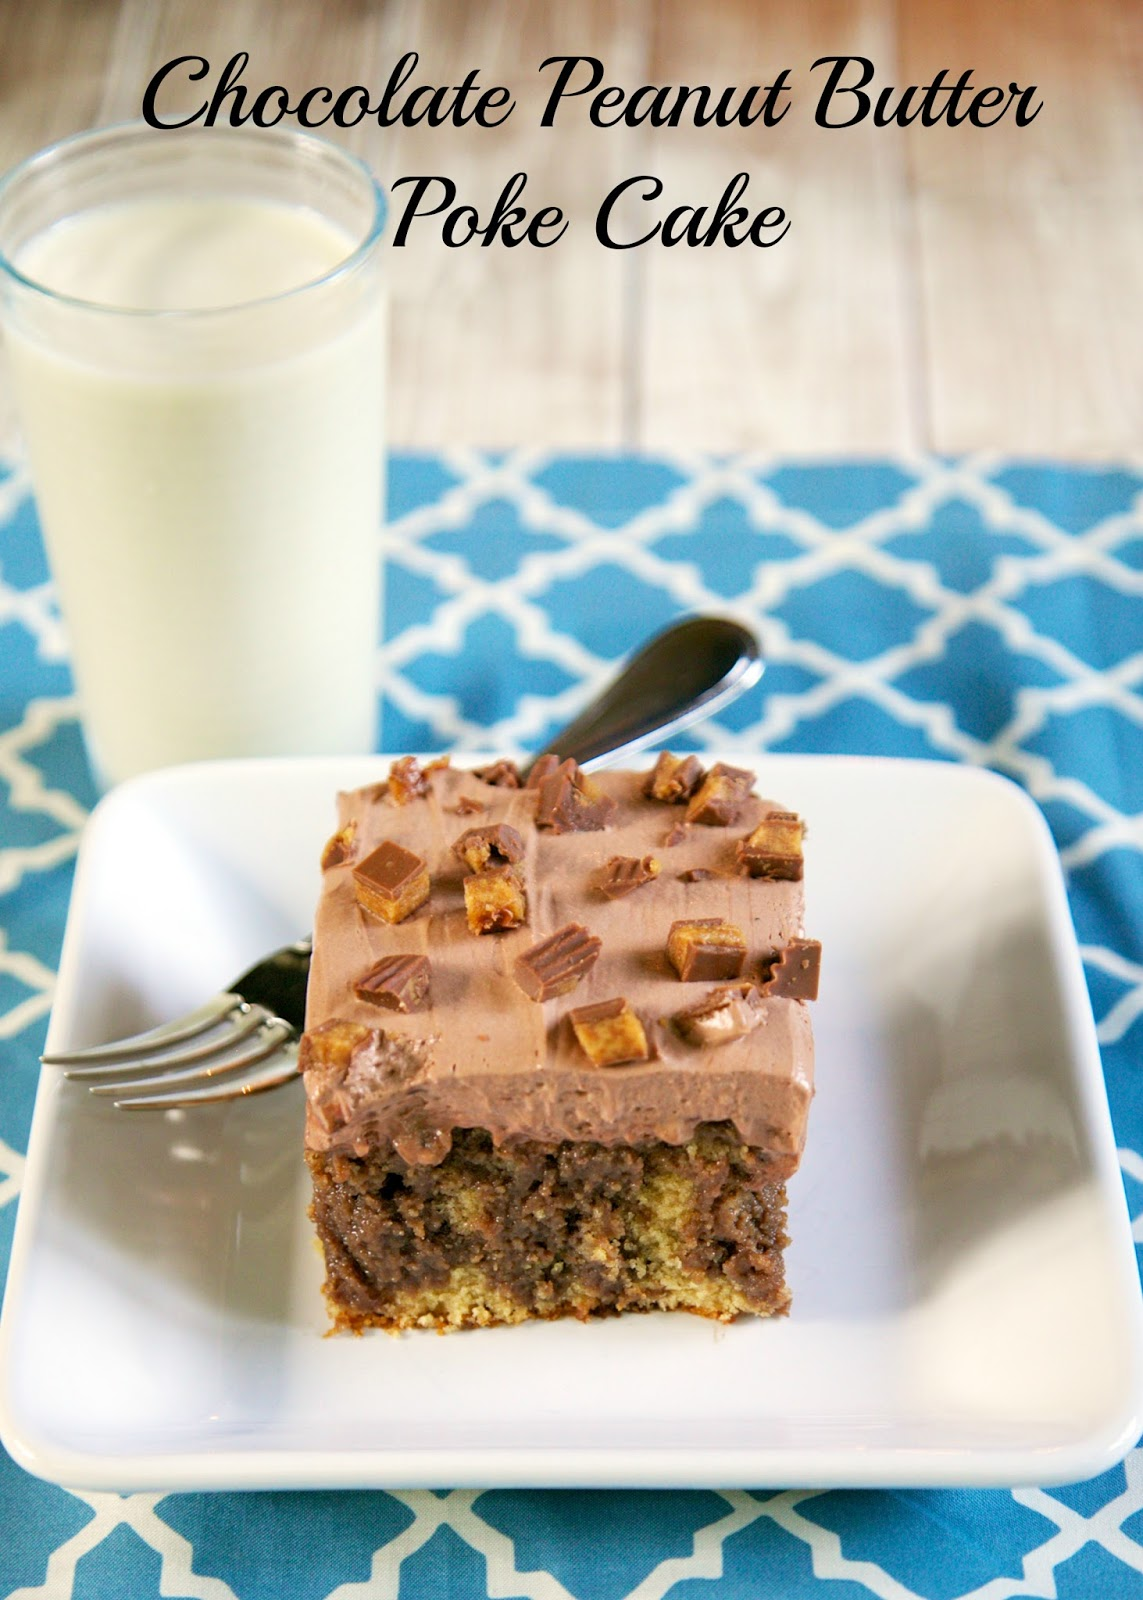 peanut butter poke cake (1)A